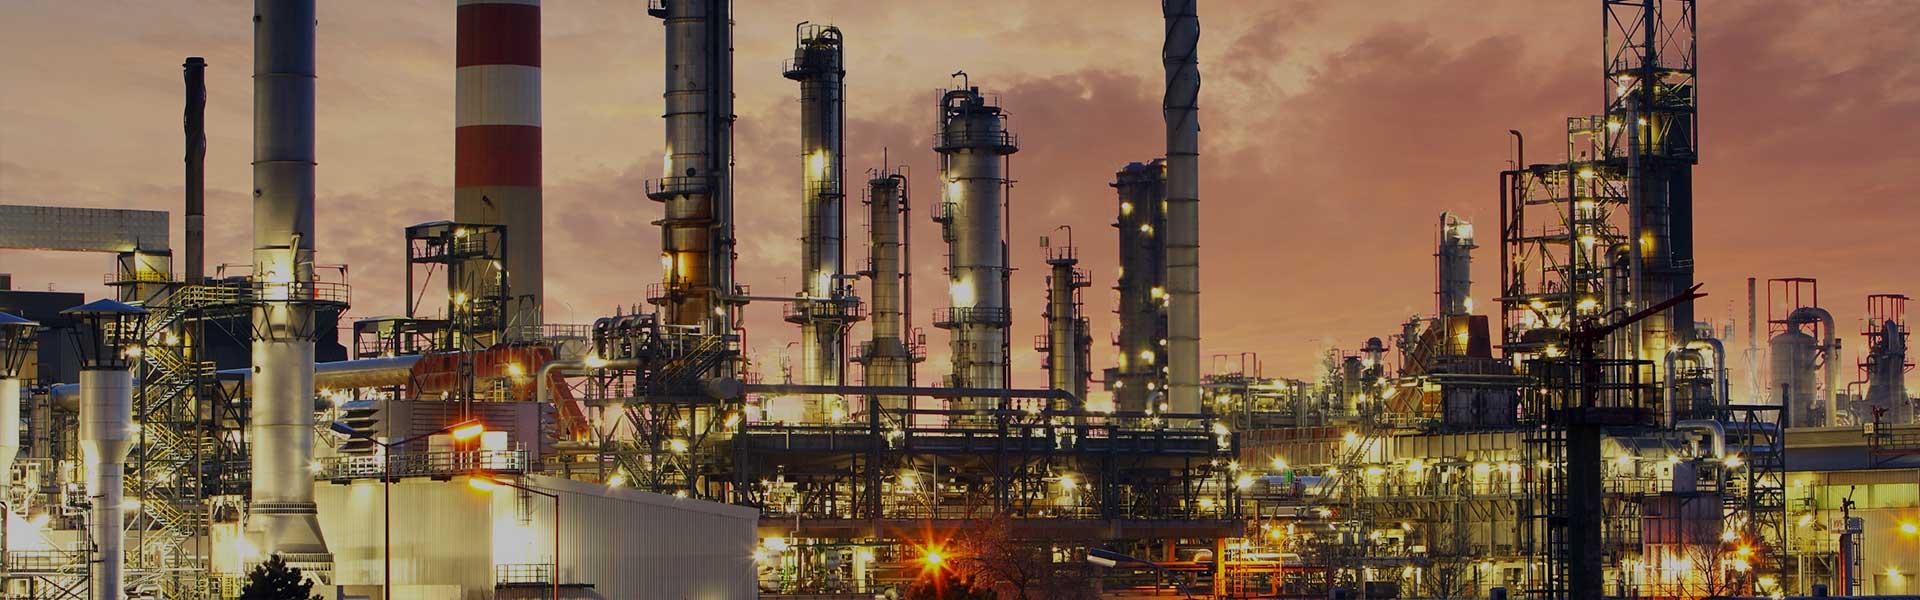 Napa Napa Oil Refinery